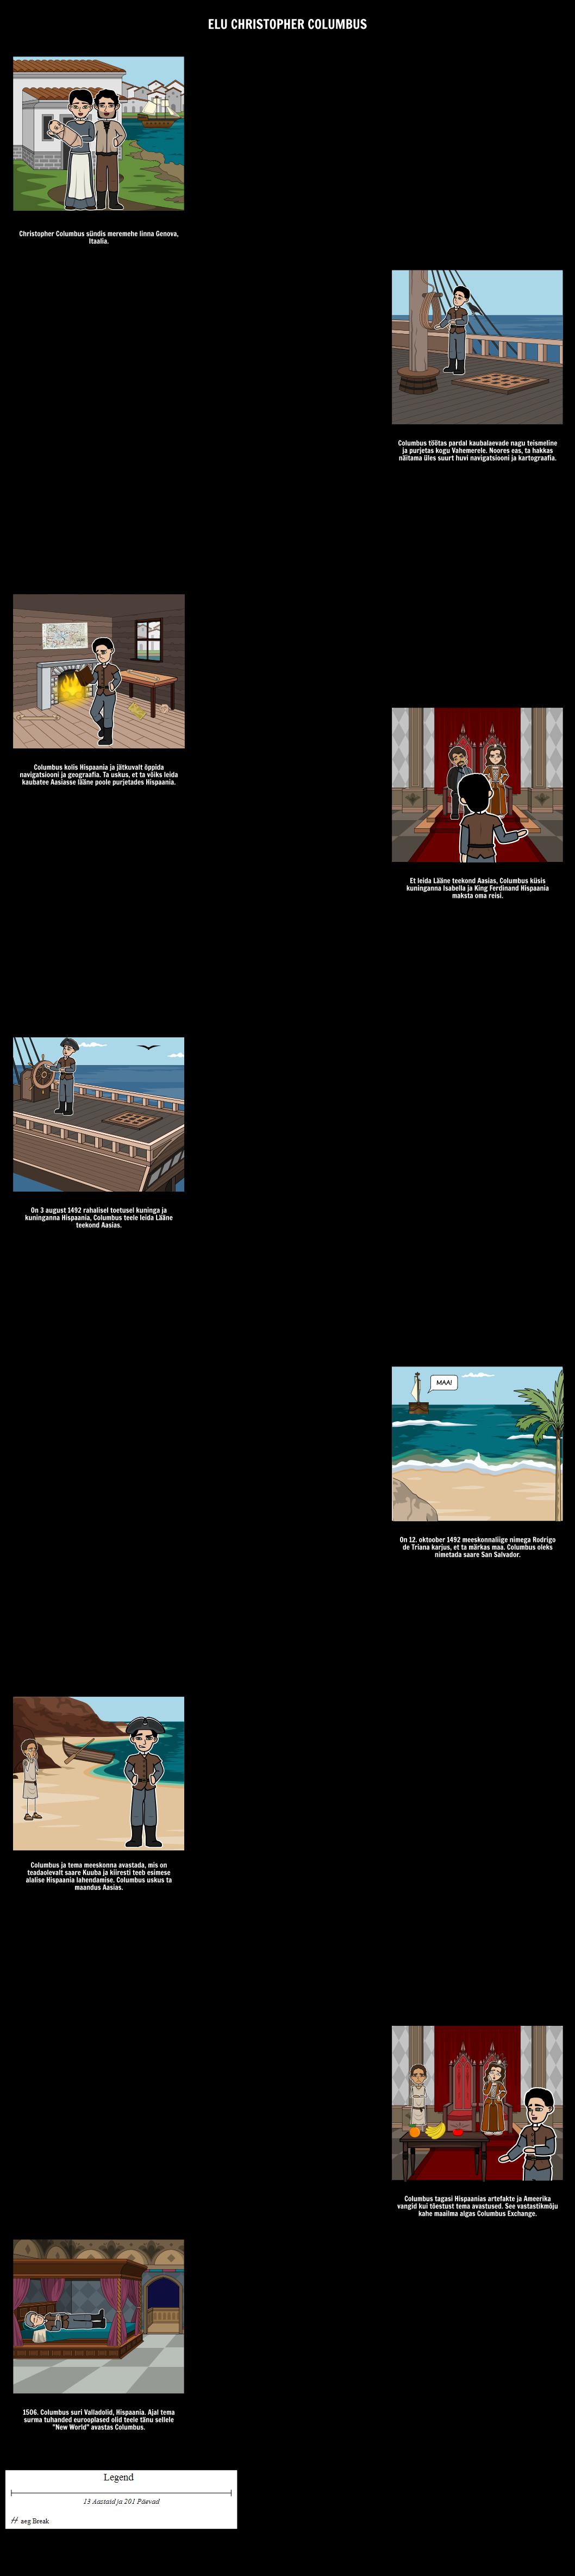 Vanus Exploration - Christopher Columbus Timeline